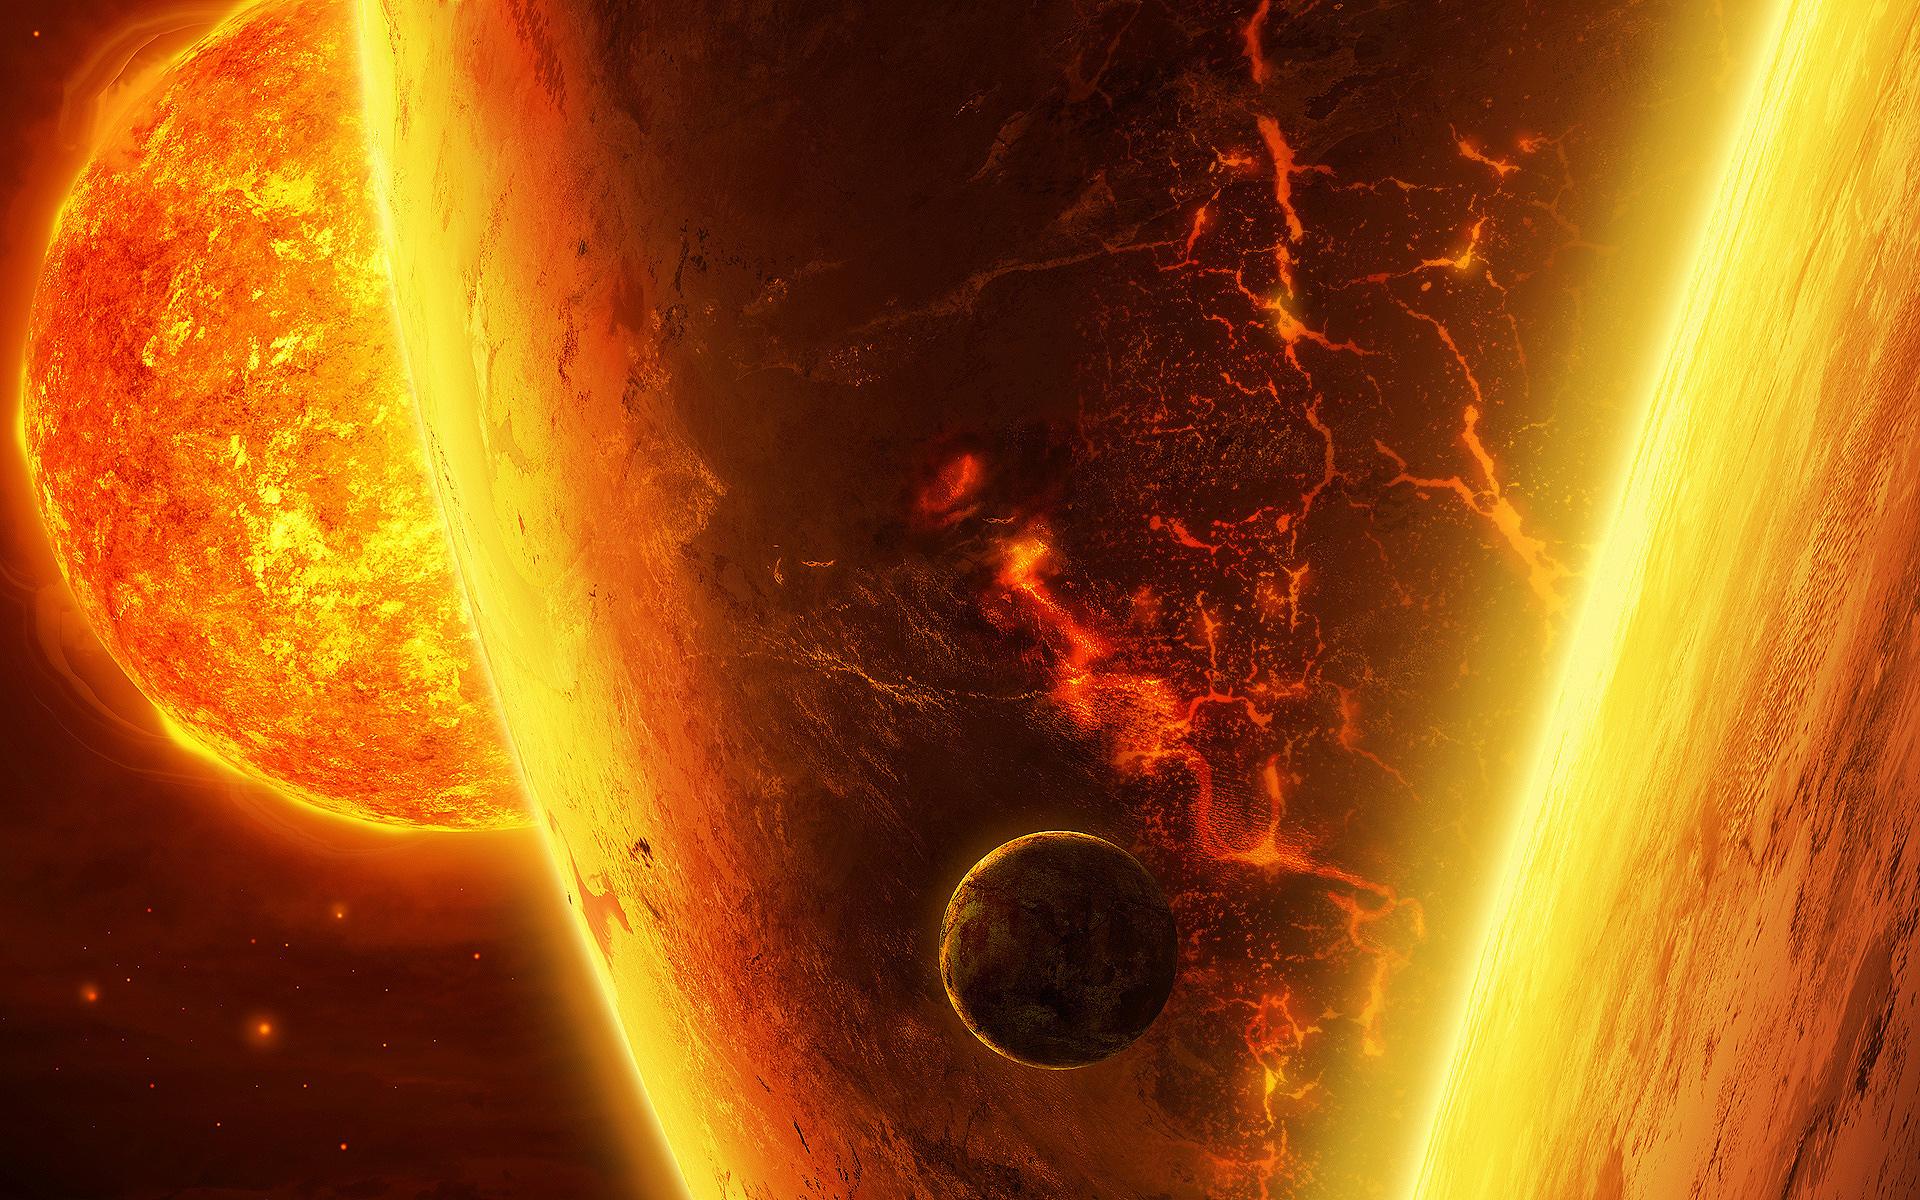 Burning Planets